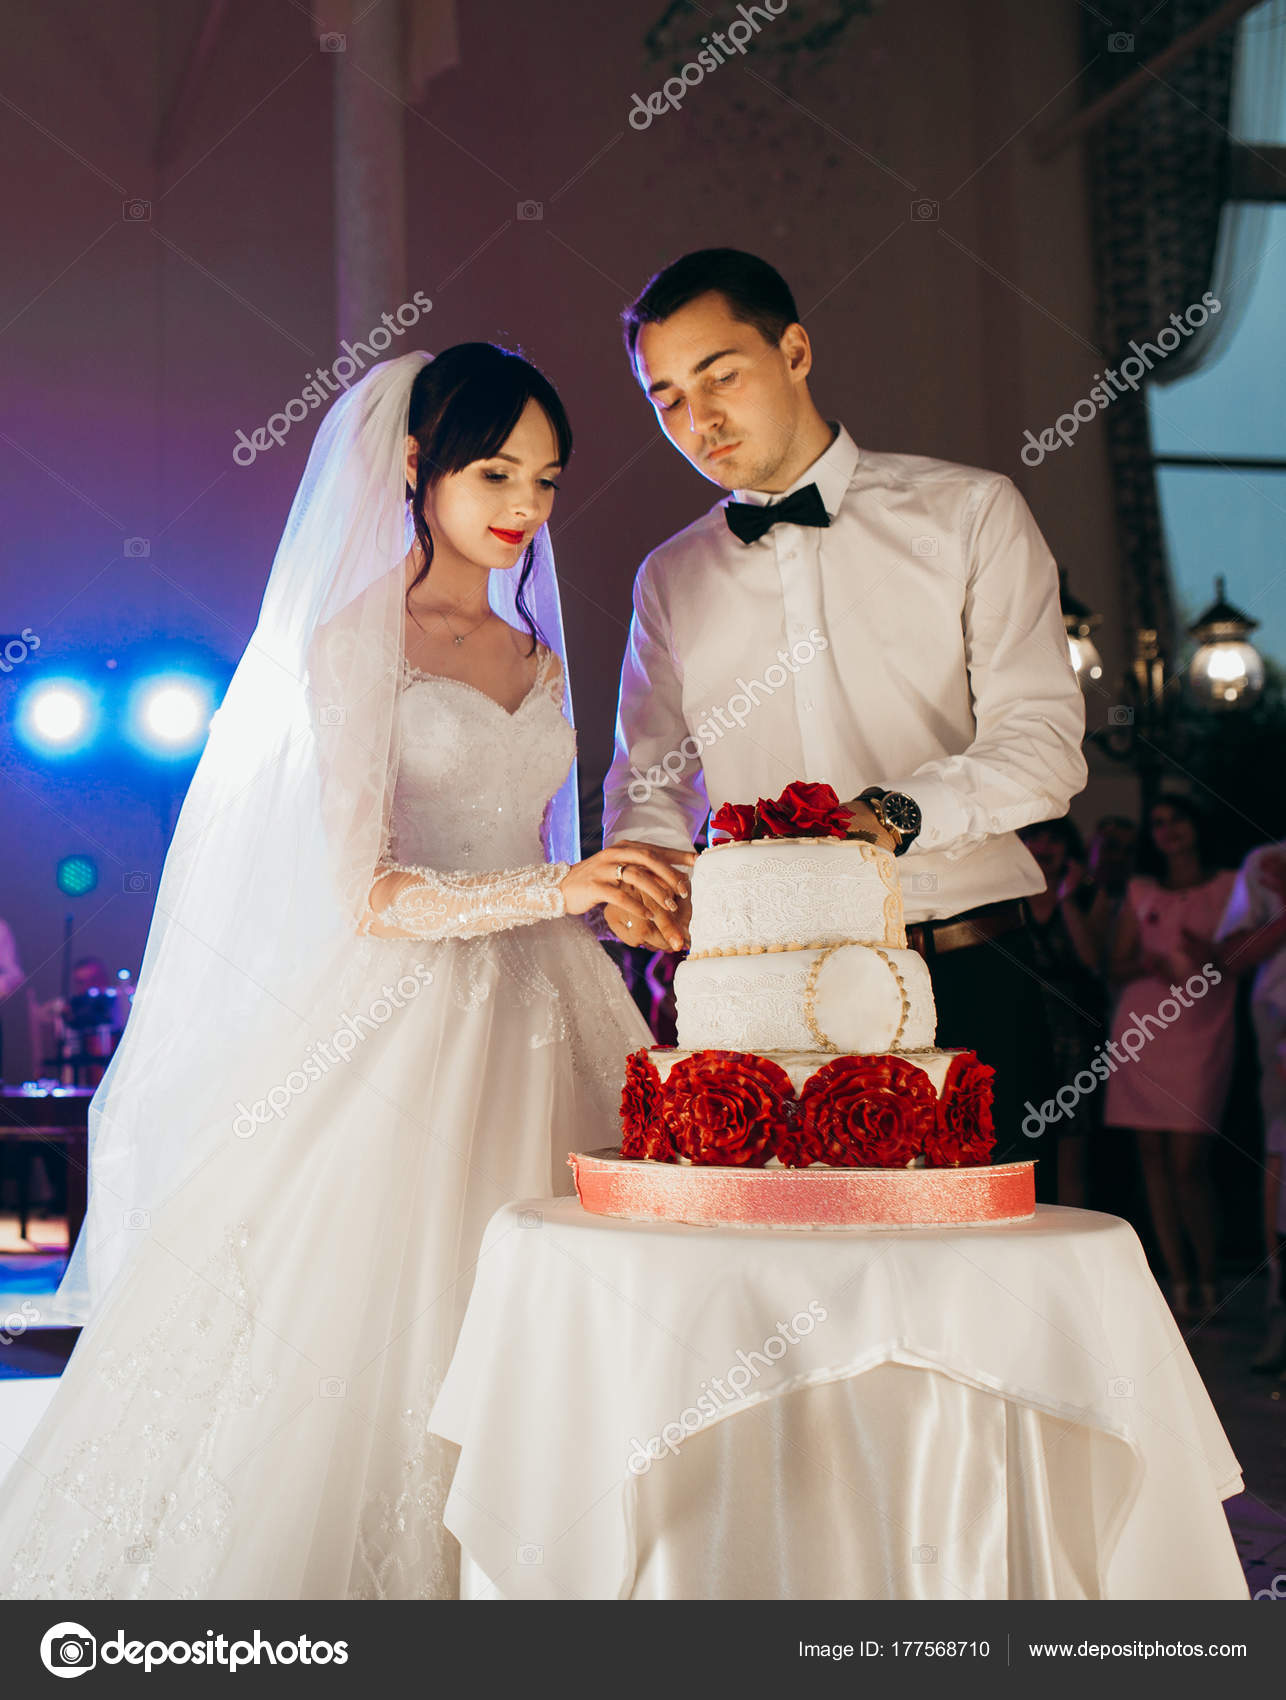 Bride Groom Cutting Wedding Cake Stock Photo Amvorsuf 177568710